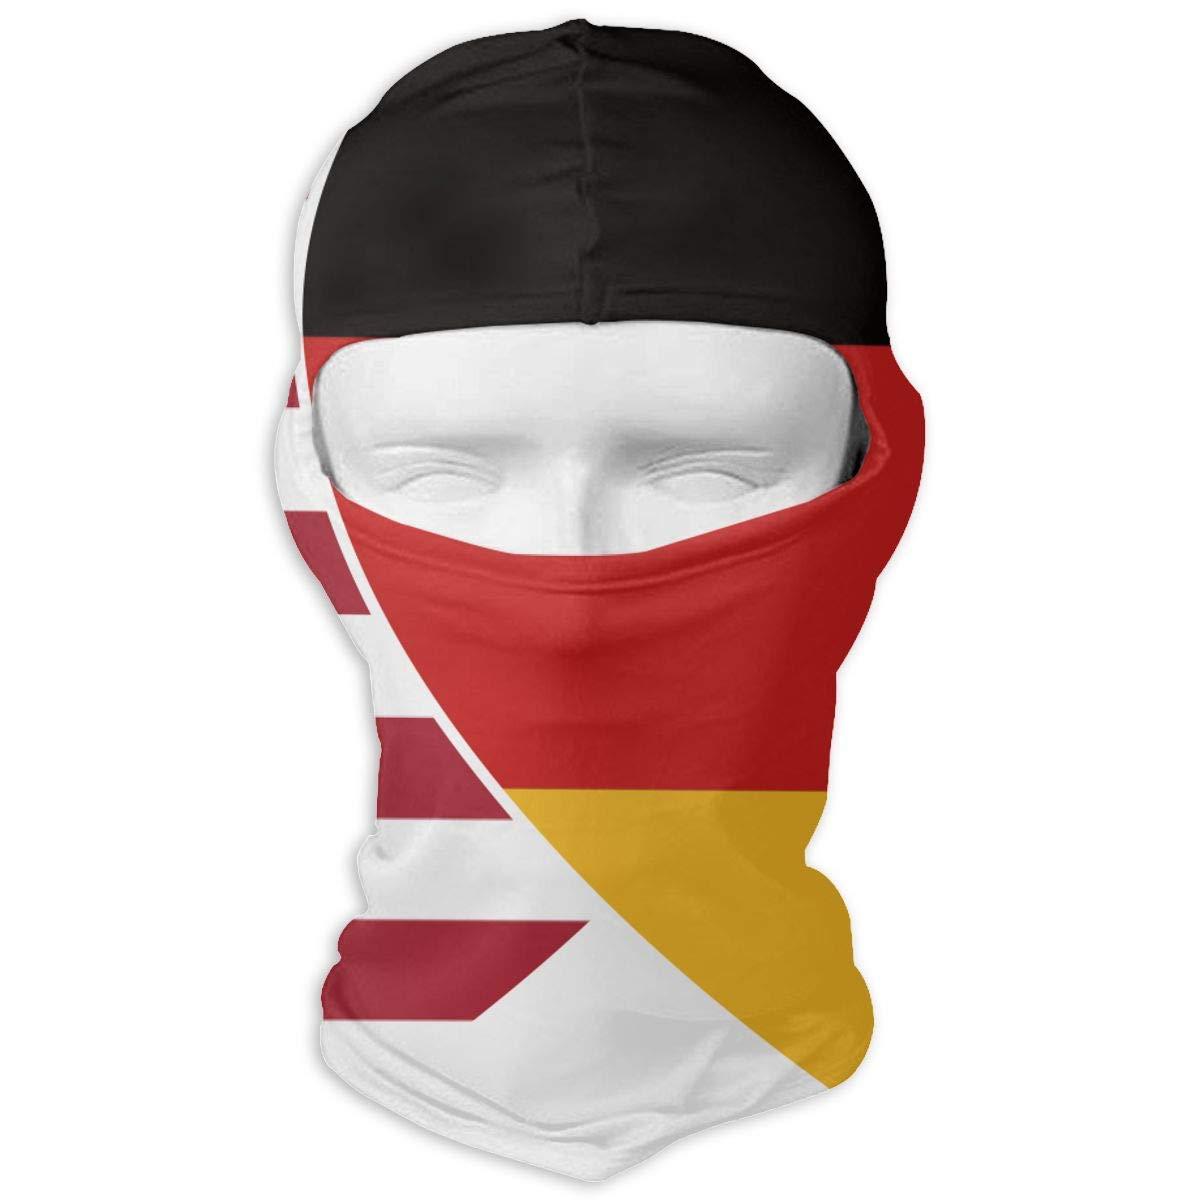 Giinly Germany USA Flag Twin Heart Outdoor Cycling Ski Motorcycle Balaclava Mask Sunscreen Hat Windproof Cap